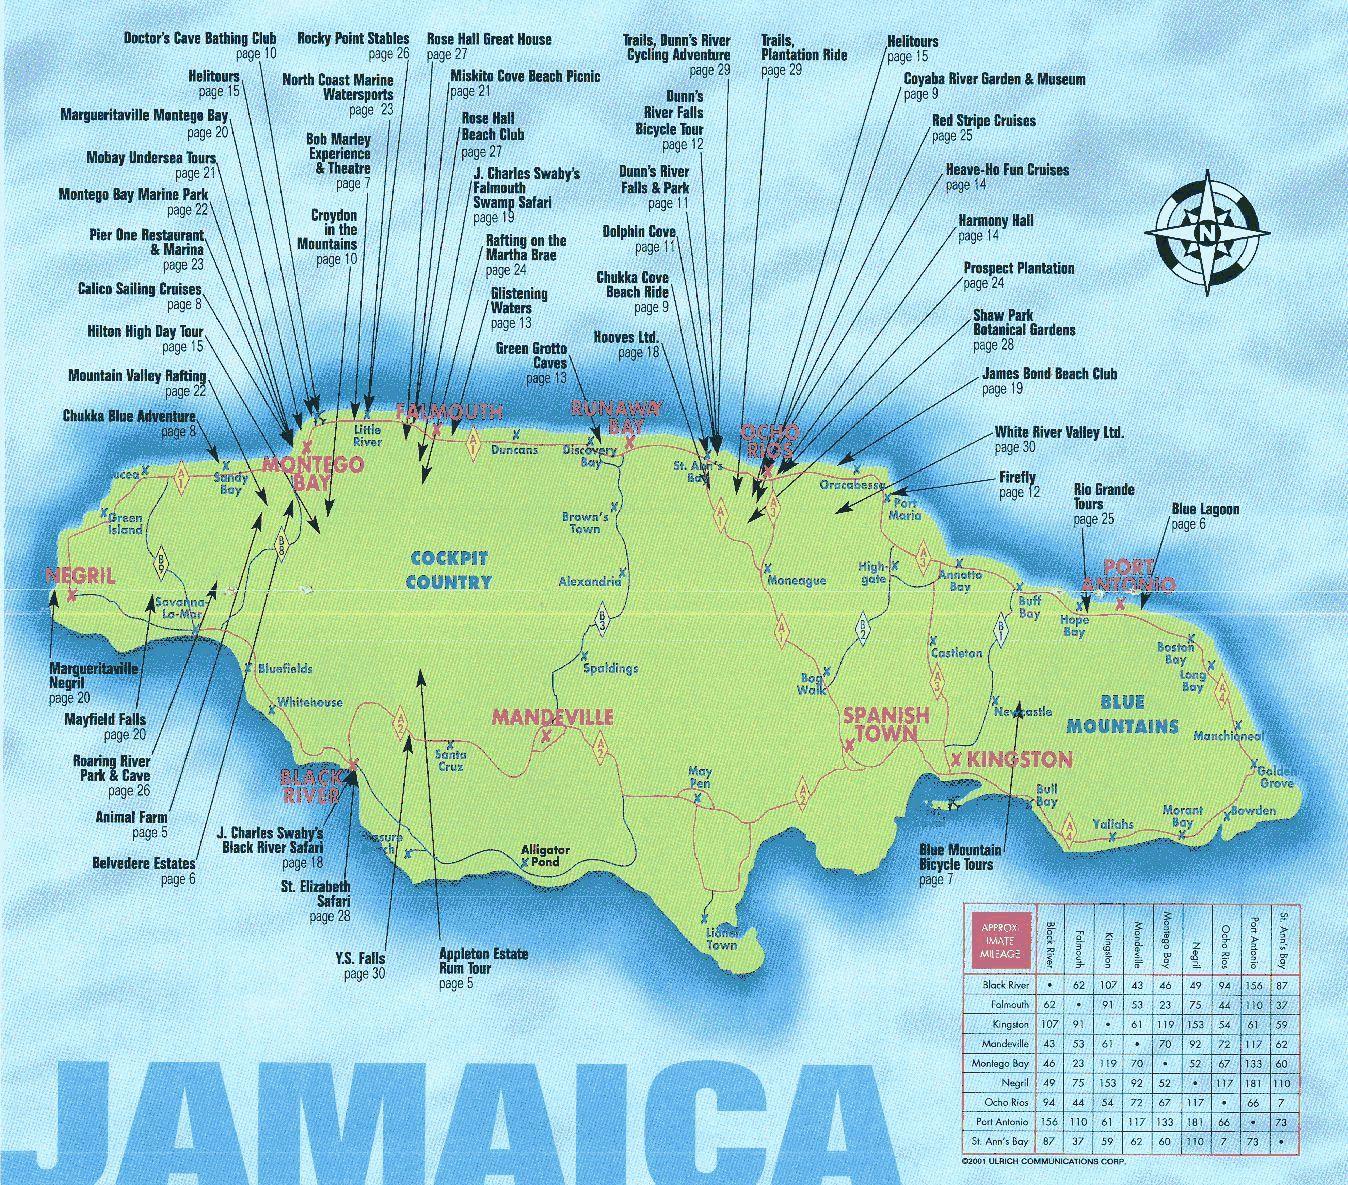 Jamaican Sights